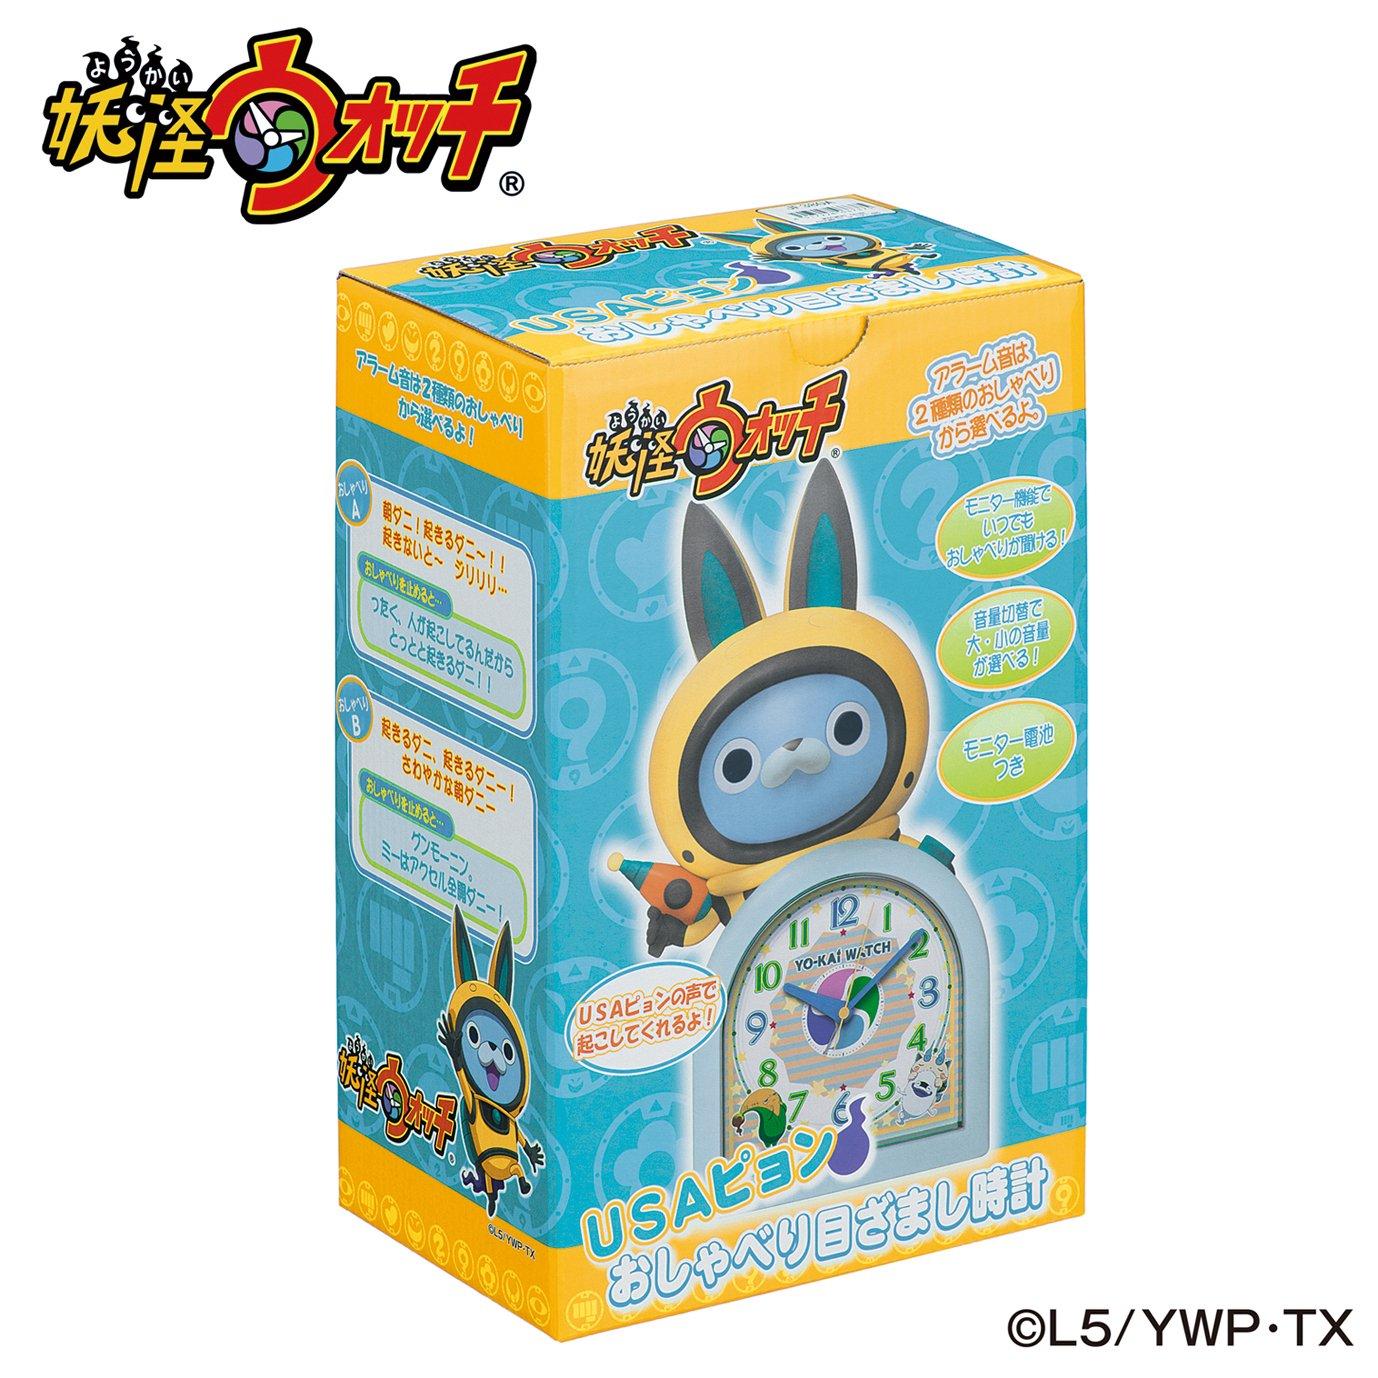 Seiko Yokai Reloj de Cuarzo Reloj Despertador (Blanco Perla Pintura) Estados Unidos Byun jf380 a: Amazon.es: Hogar